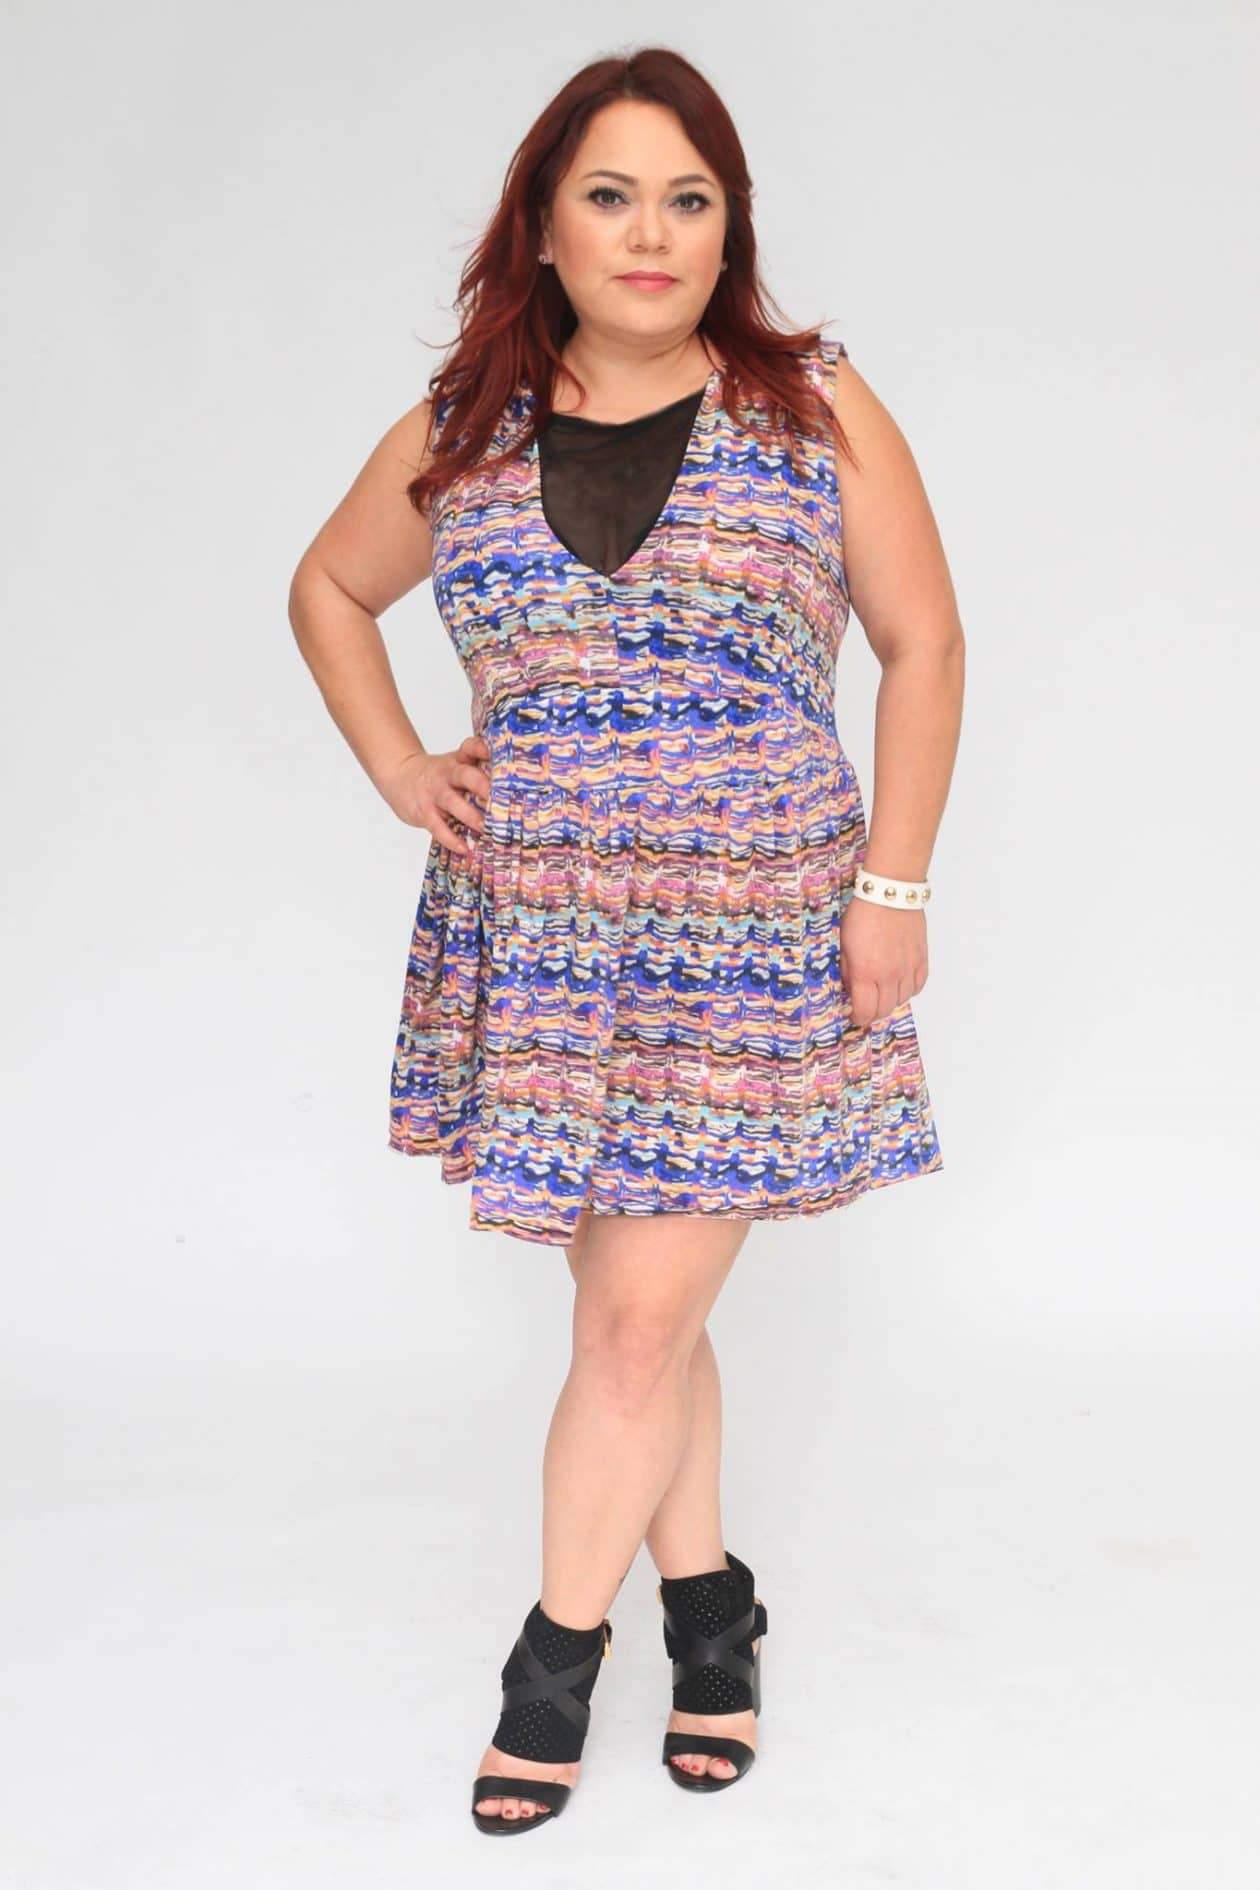 Myrda J Petite Plus Size & Custom: Deep V Dress